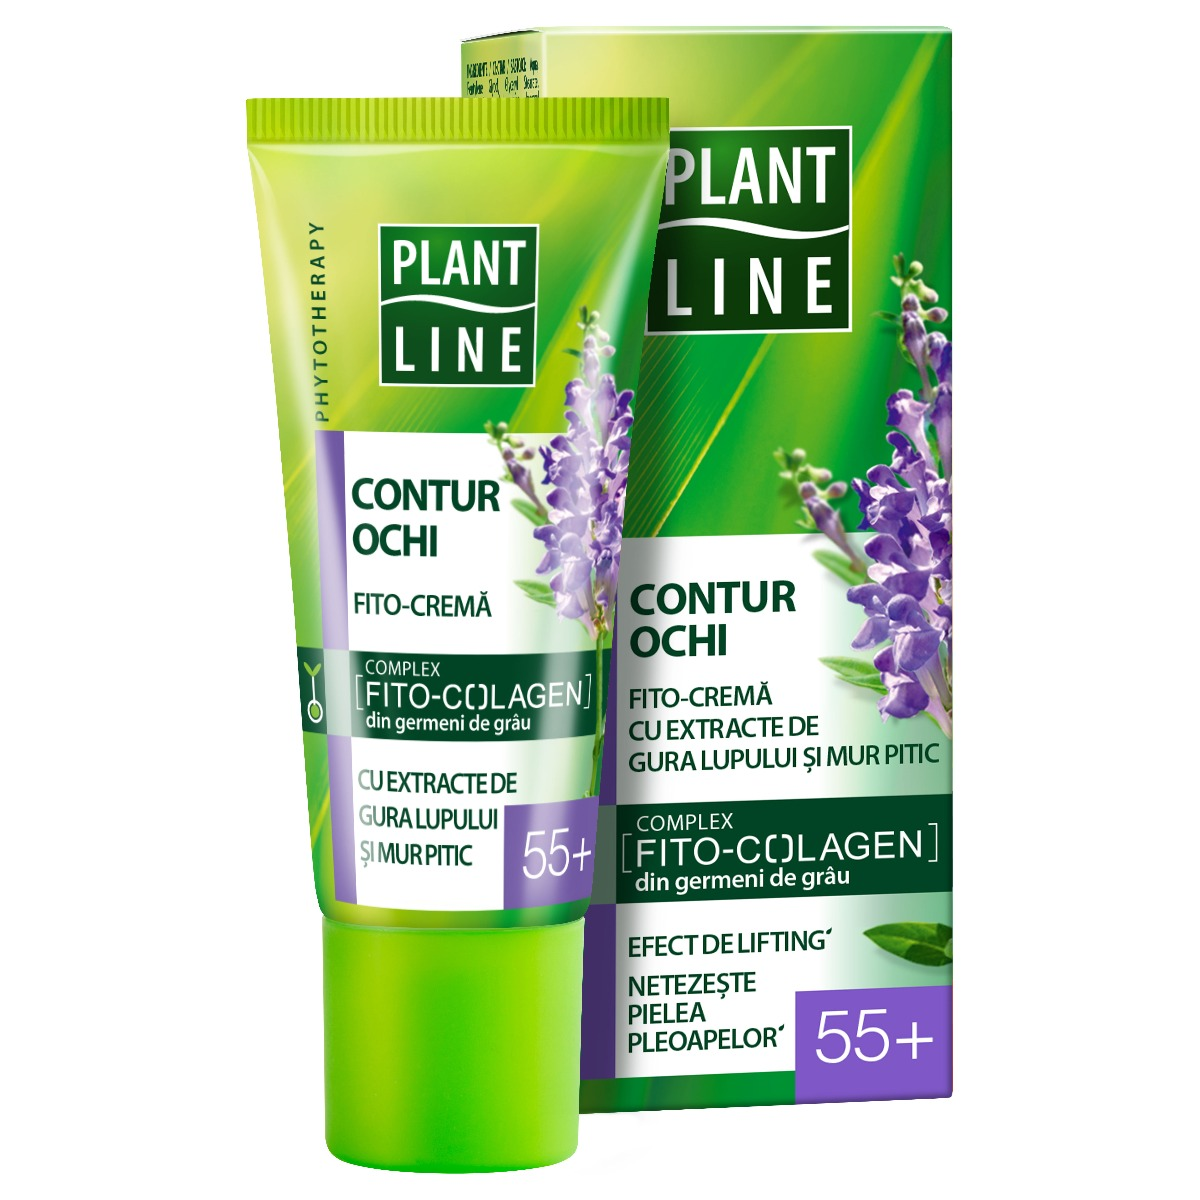 Crema de ochi Plant Line Mur Pitic, 55+, 20 ml imagine